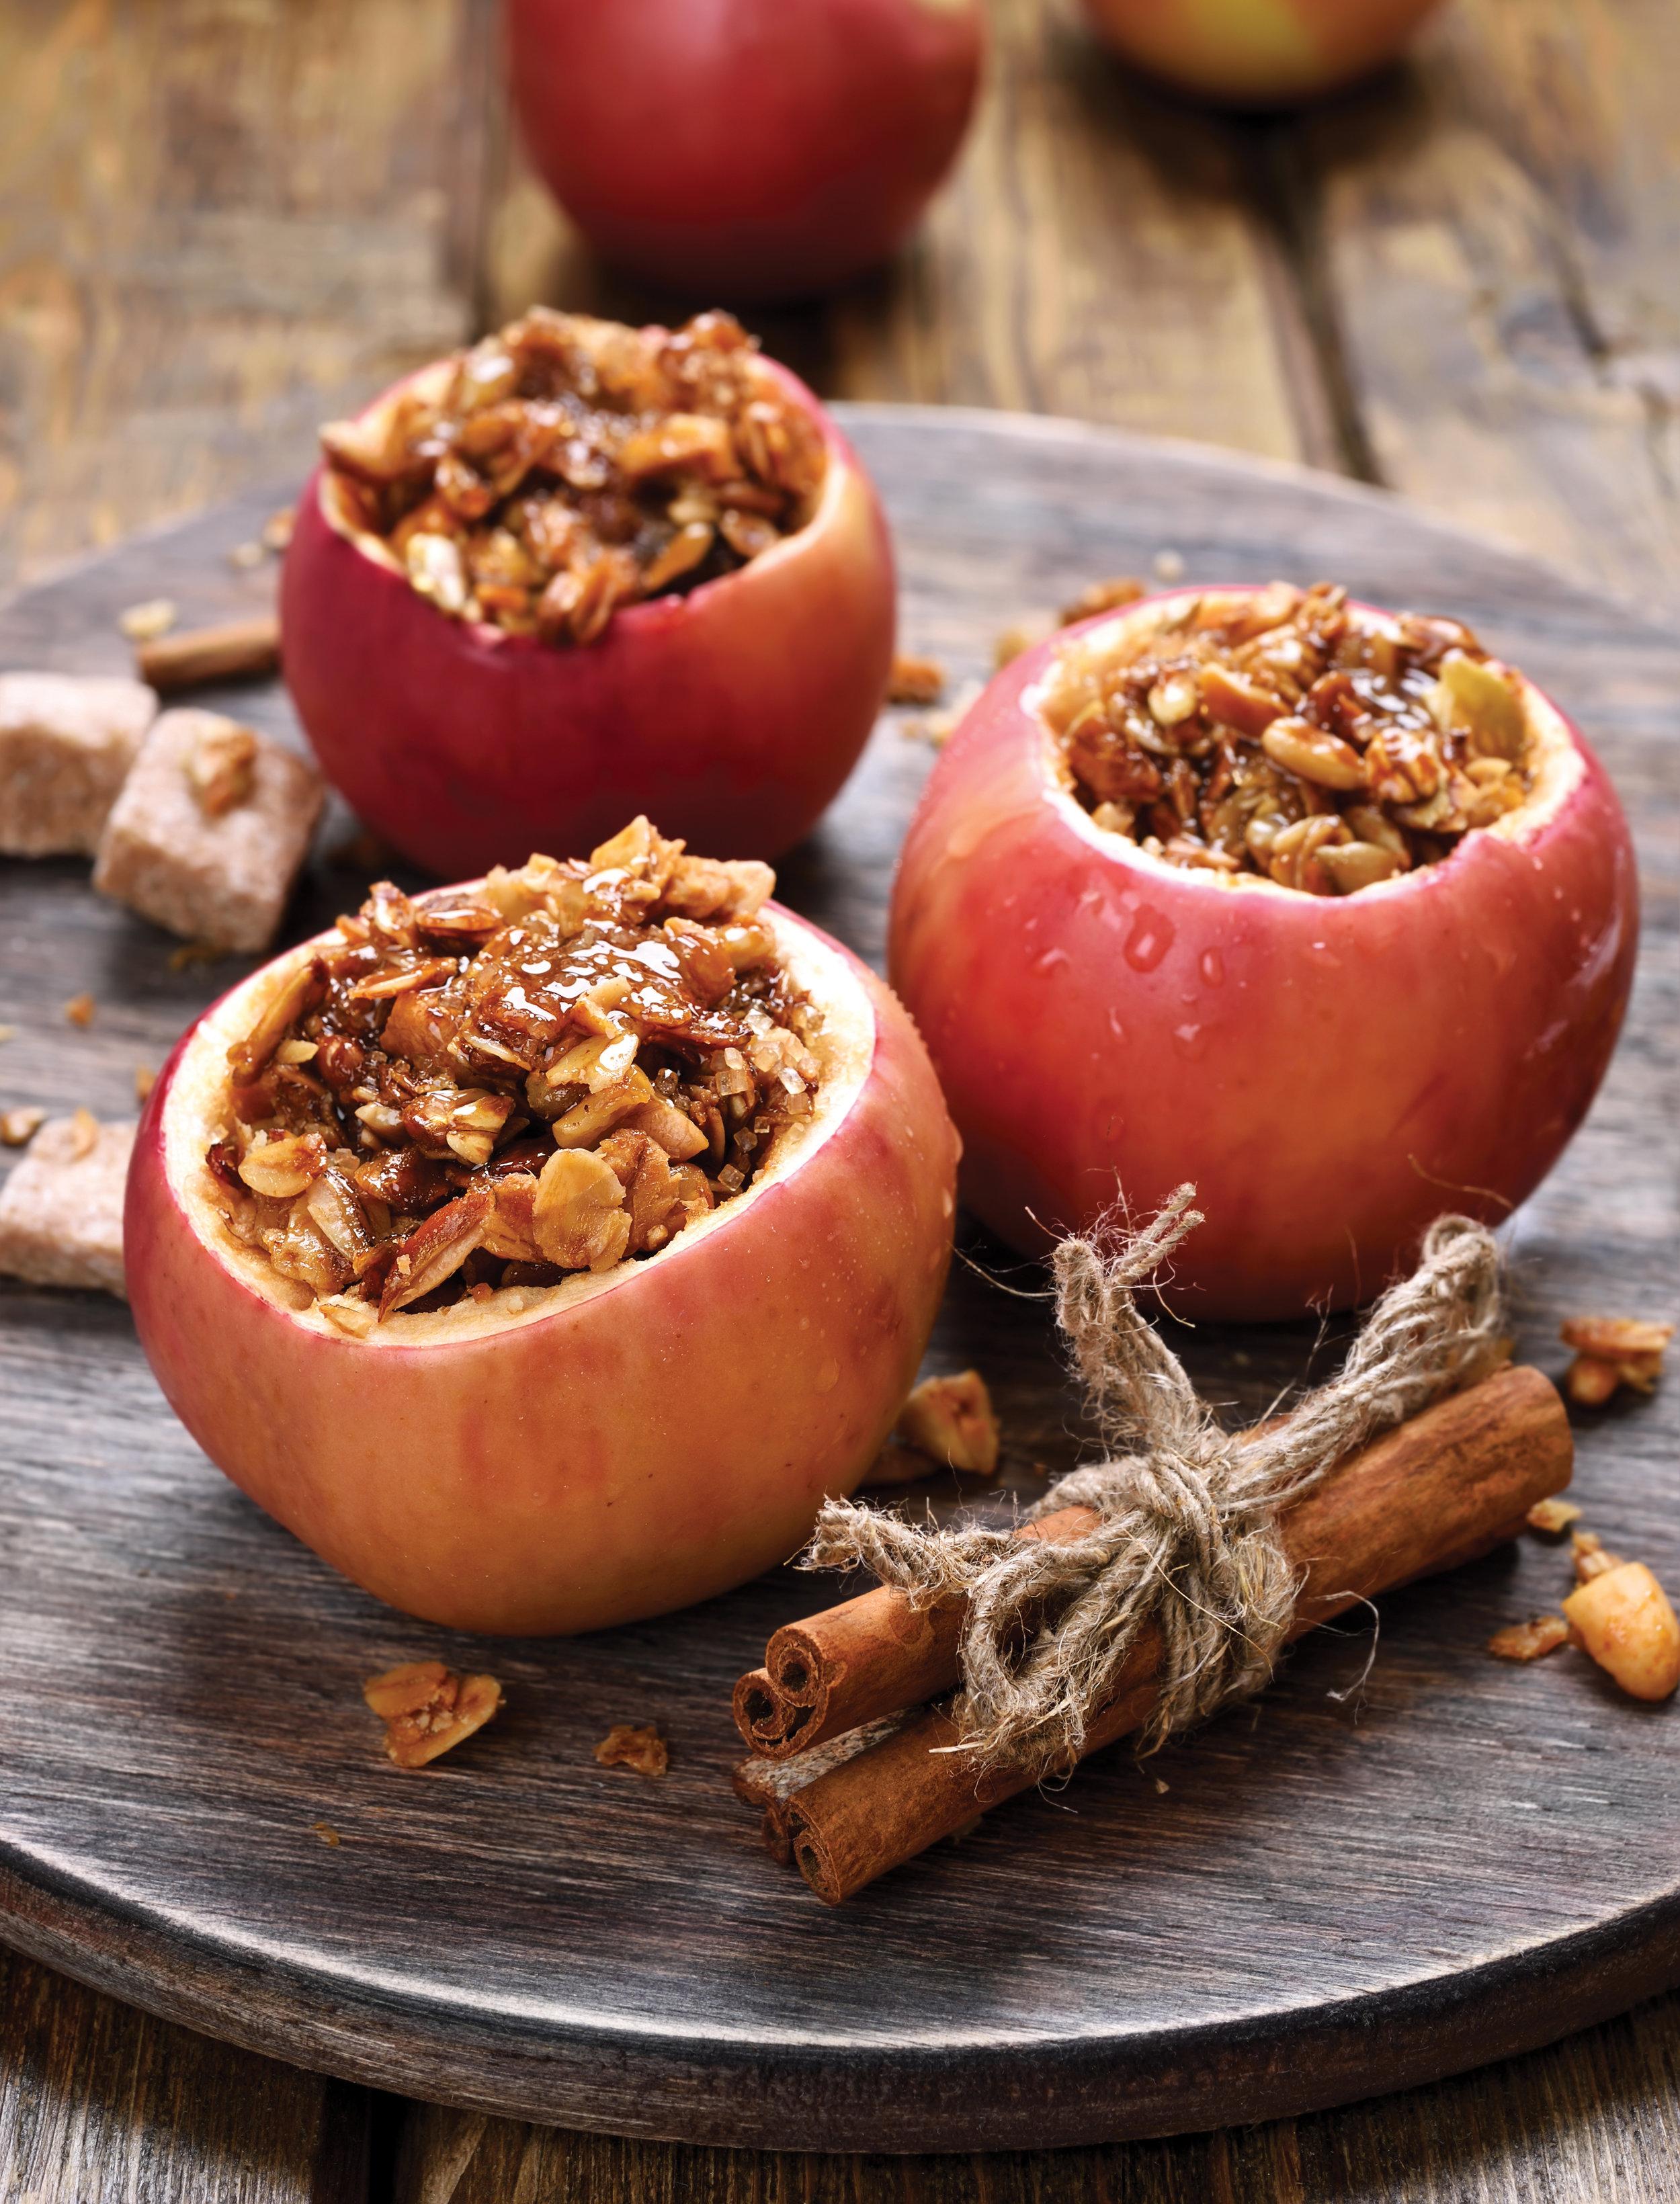 apples-stuffed-with-granola.jpg